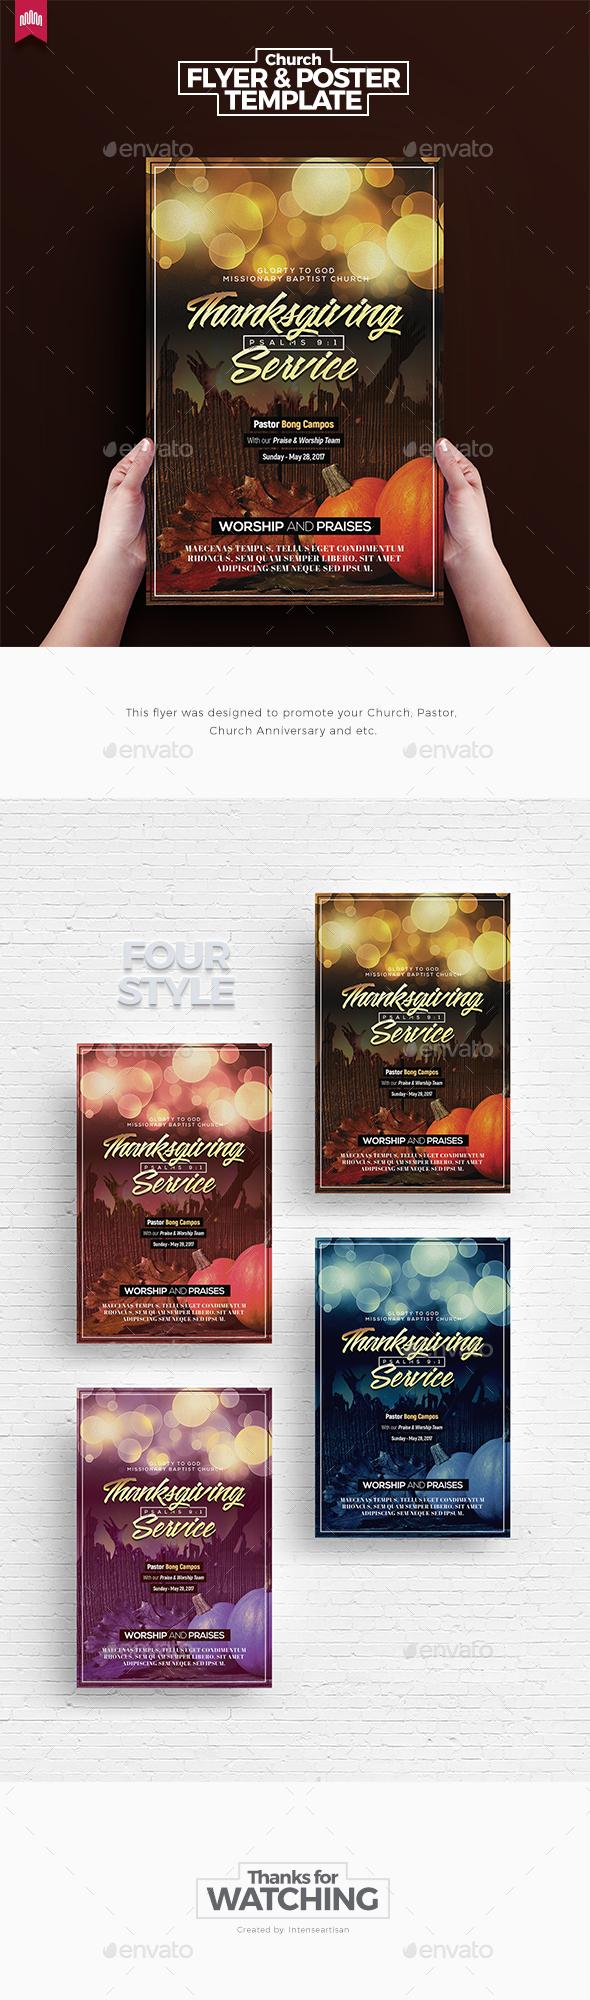 Thanksgiving Service - Church Flyer Template - Church Flyers